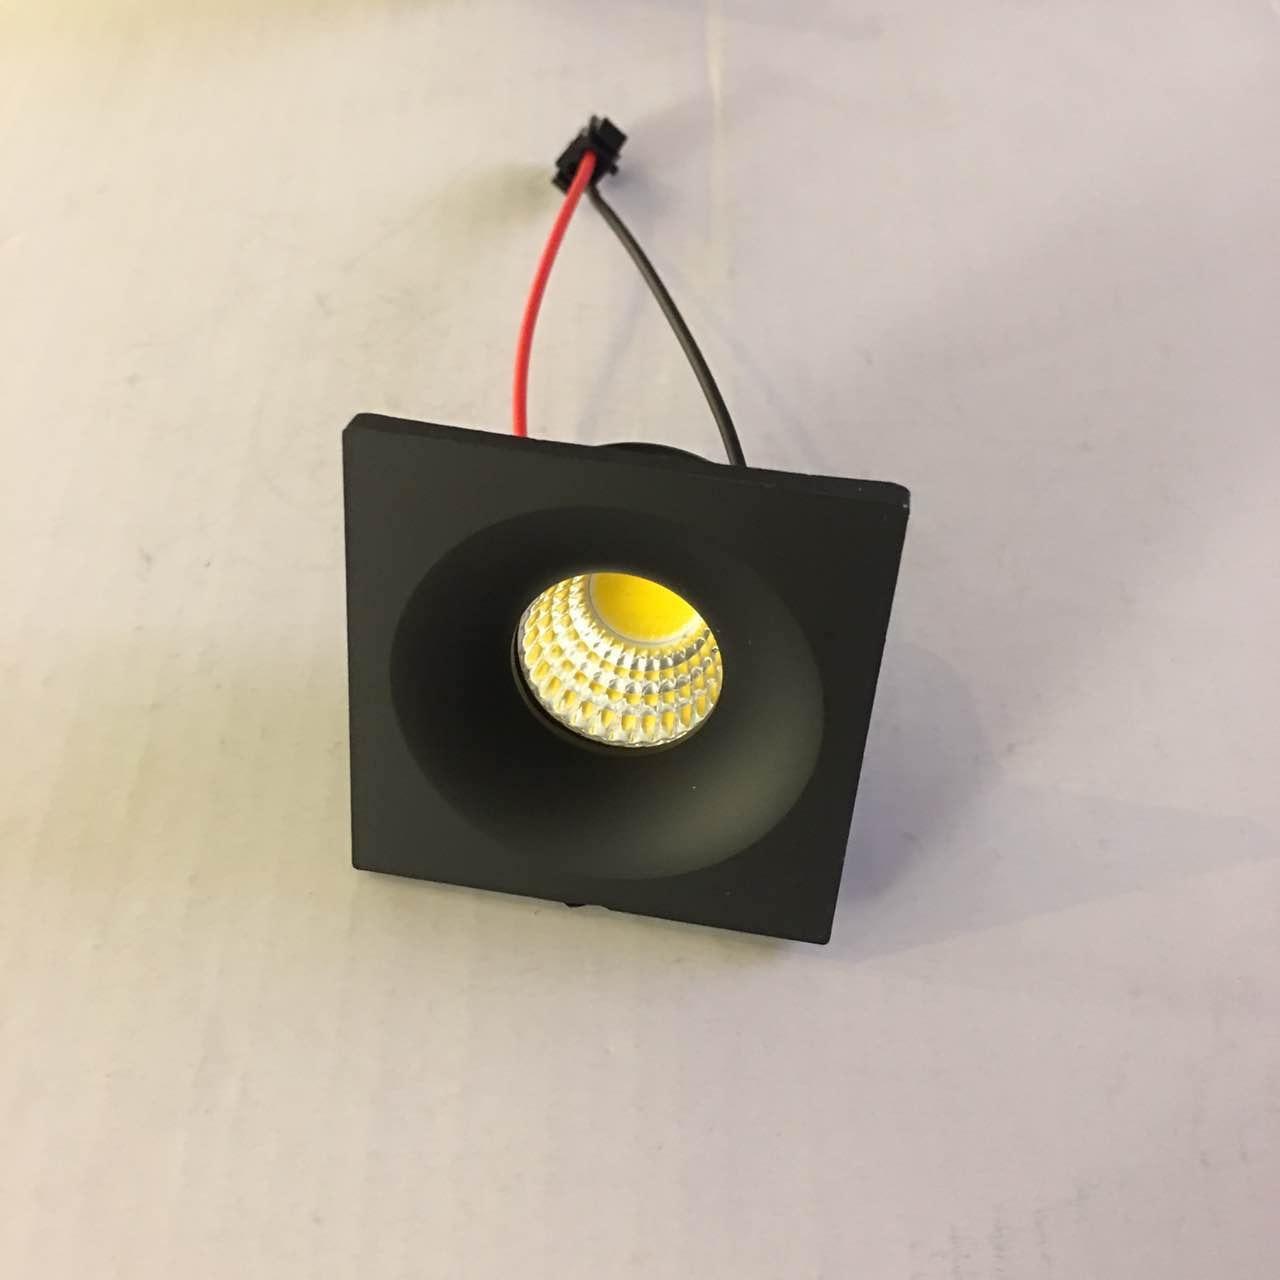 10pcs/lot Led Mini Cabinet Downlight 3w Diameter 40mm Dc12v Black Frame Recessed Ceiling No Flicker Spot Lights For Home